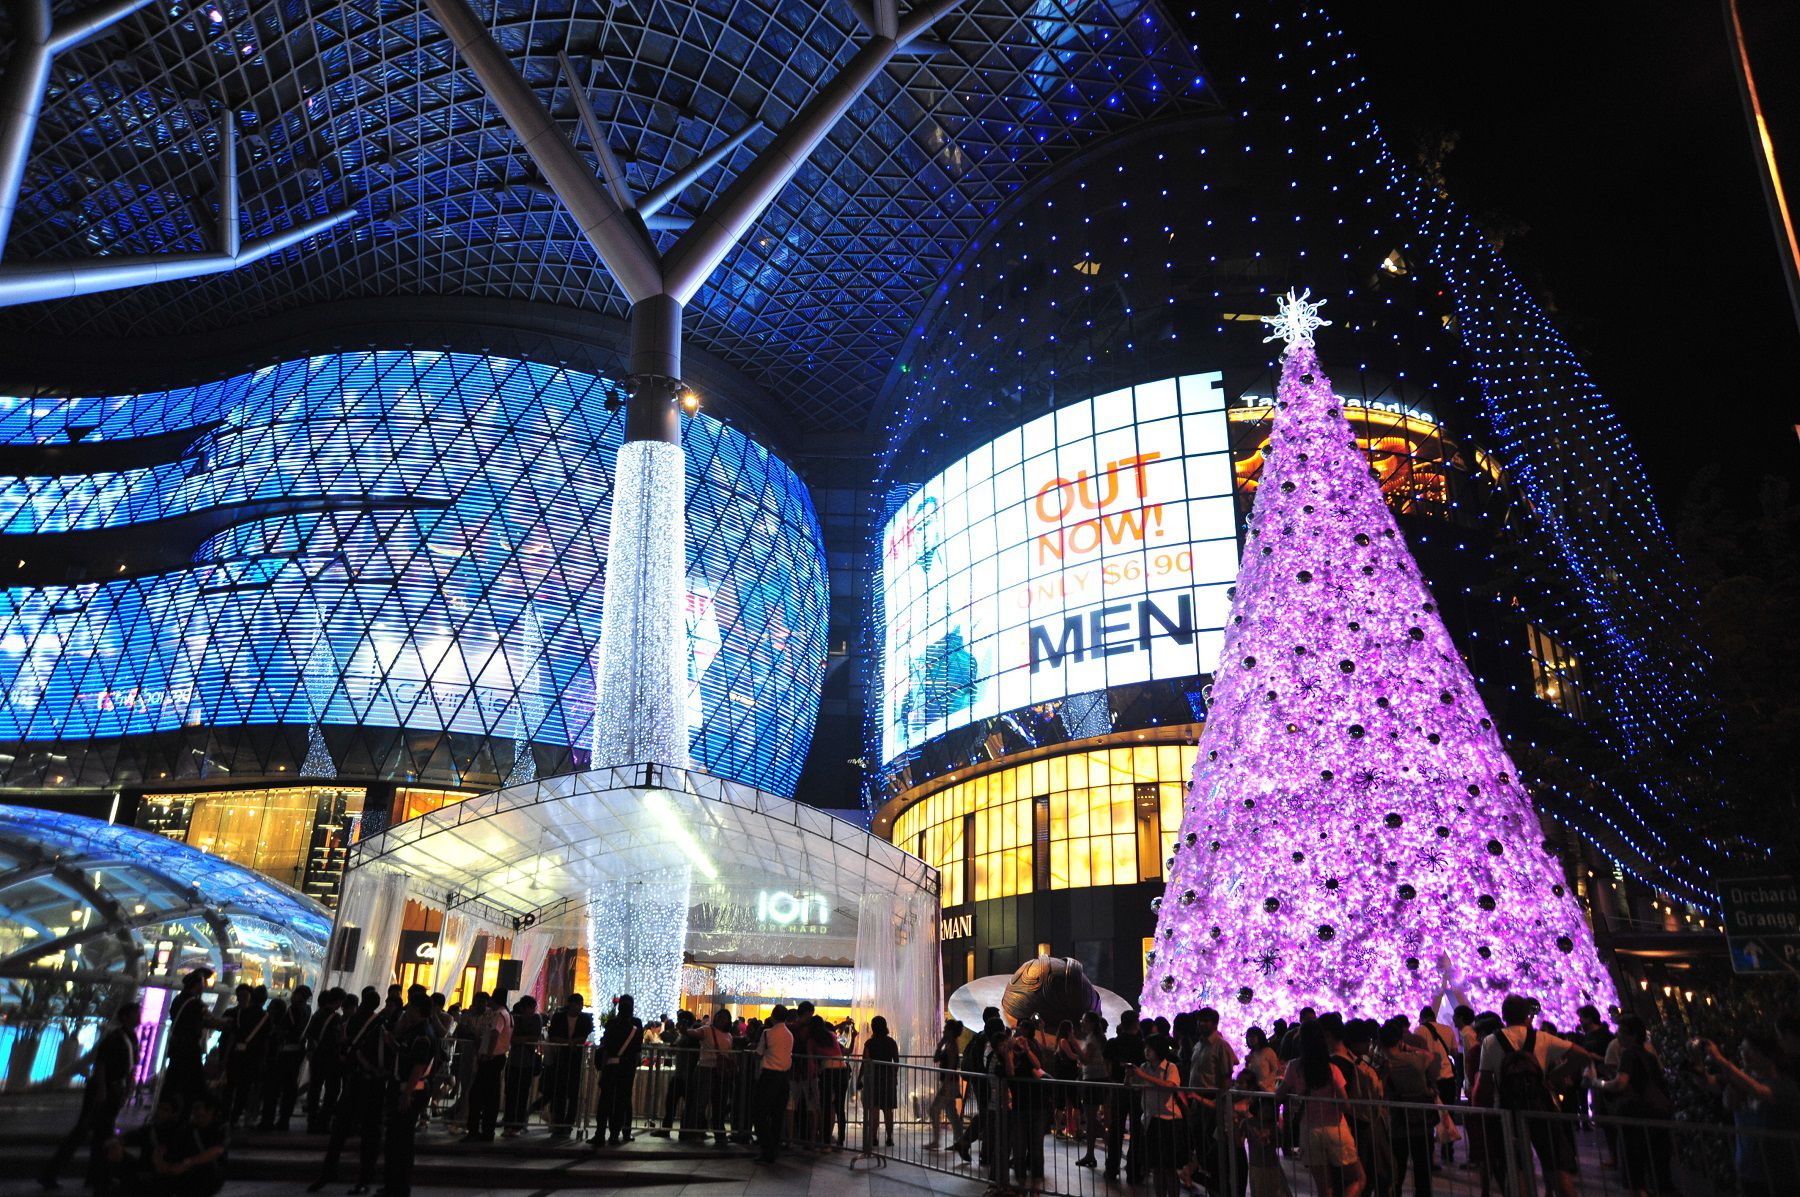 Singapore Christmas Light Ups On Orchard Road